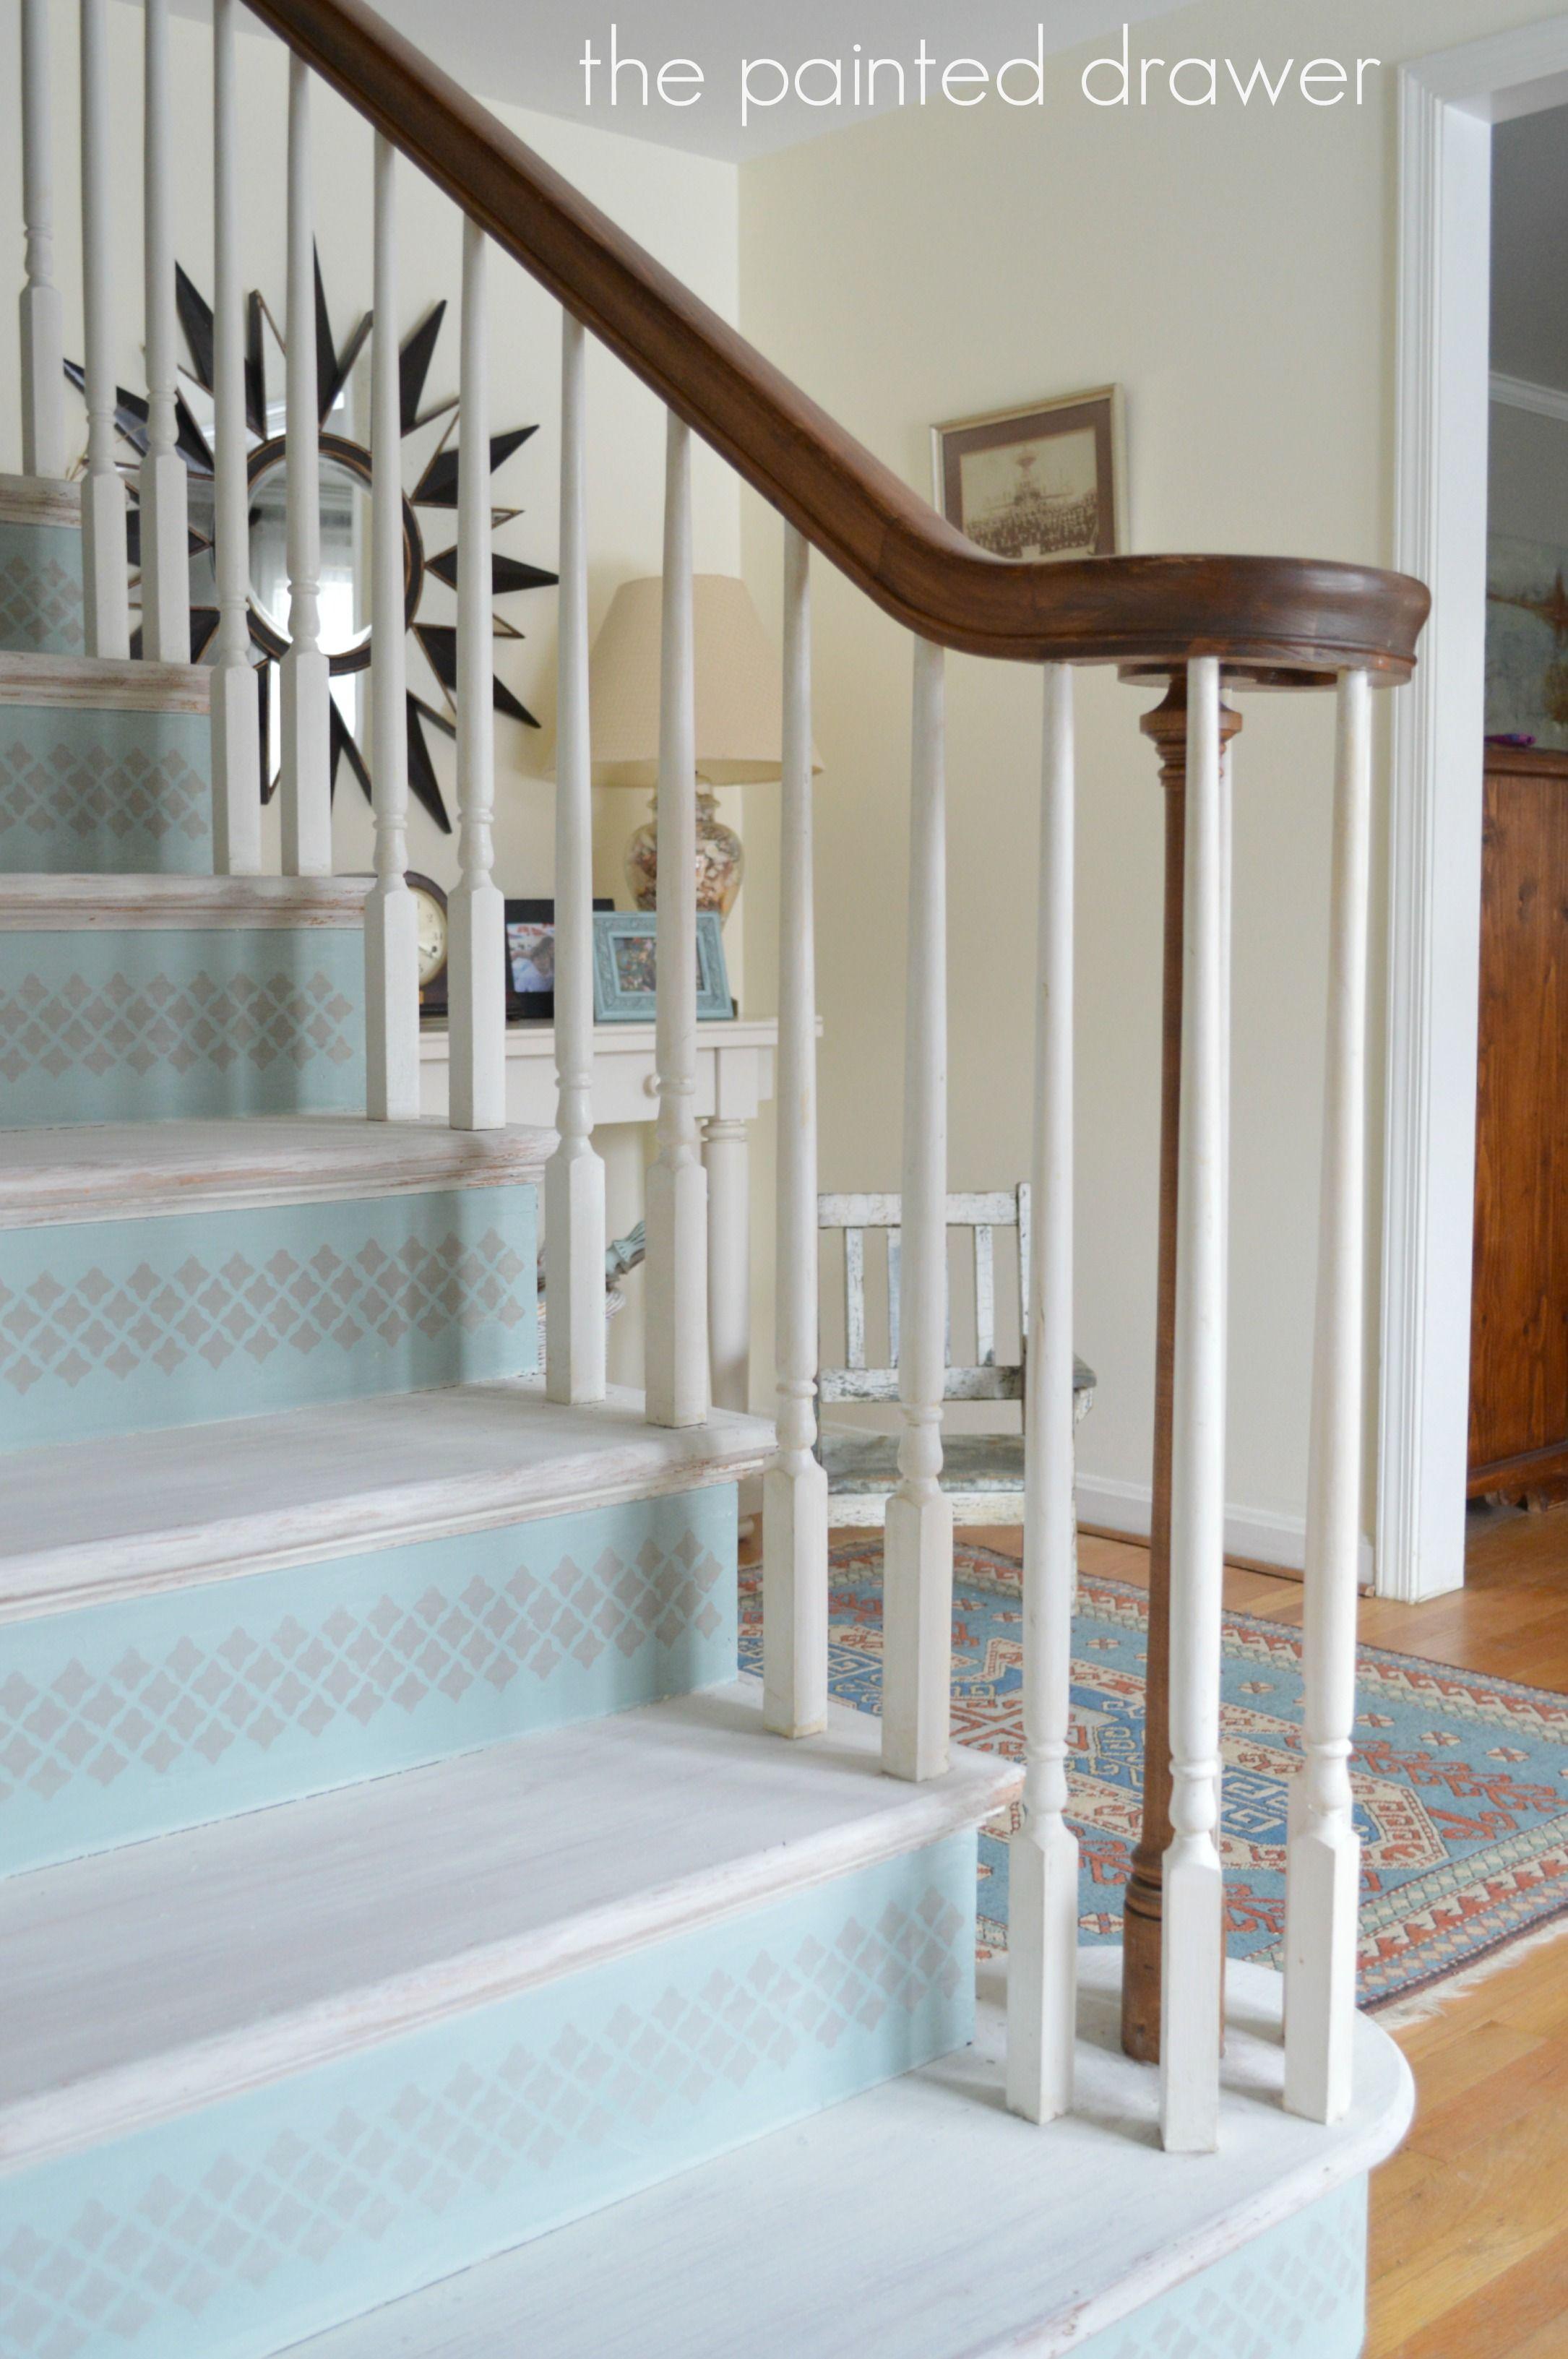 Superior Whitewashed Stairs Www.thepainteddrawer.com